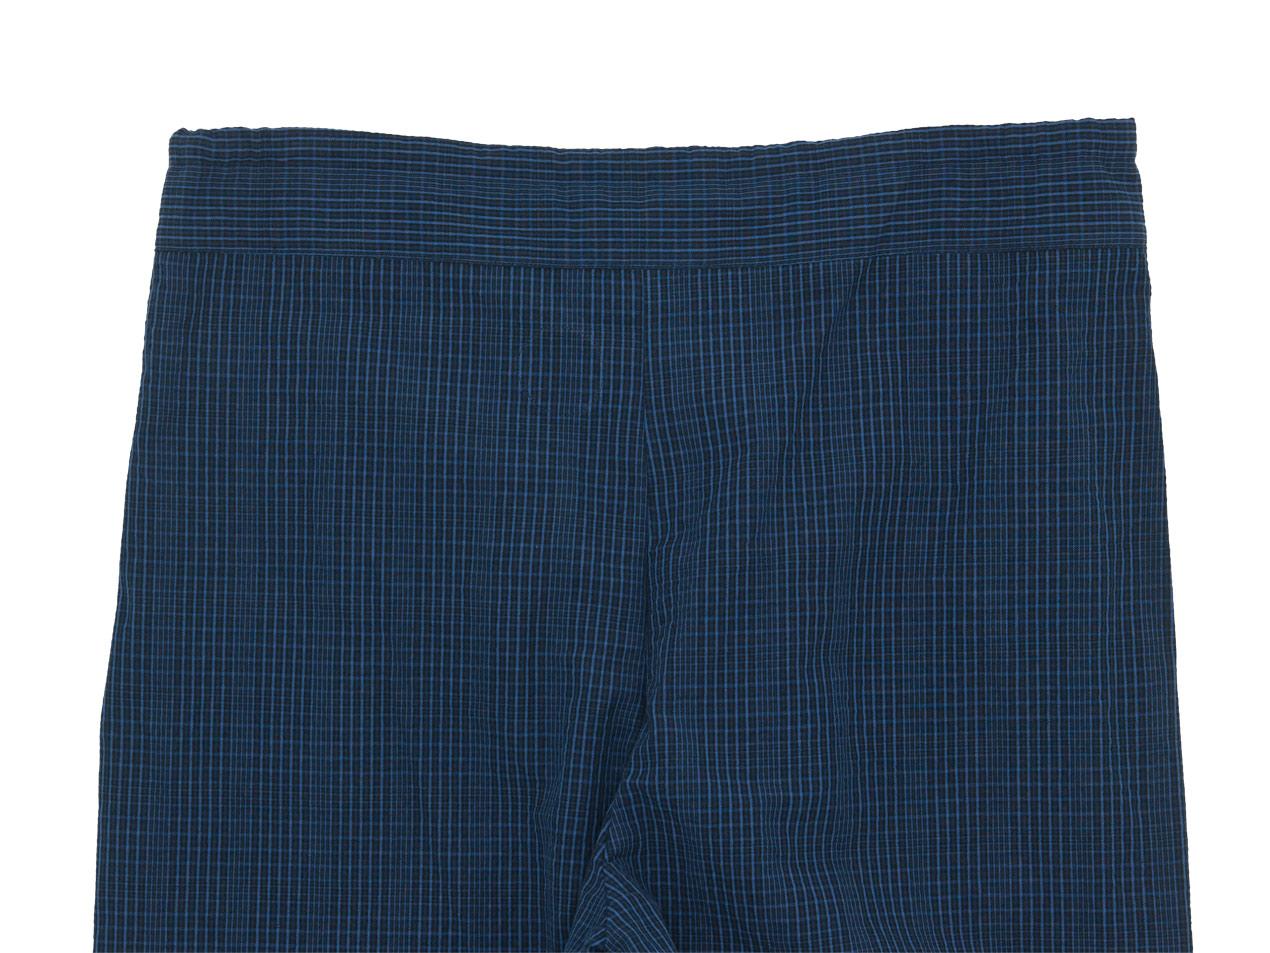 Atelier d'antan Barouh(バルー) Easy Pants